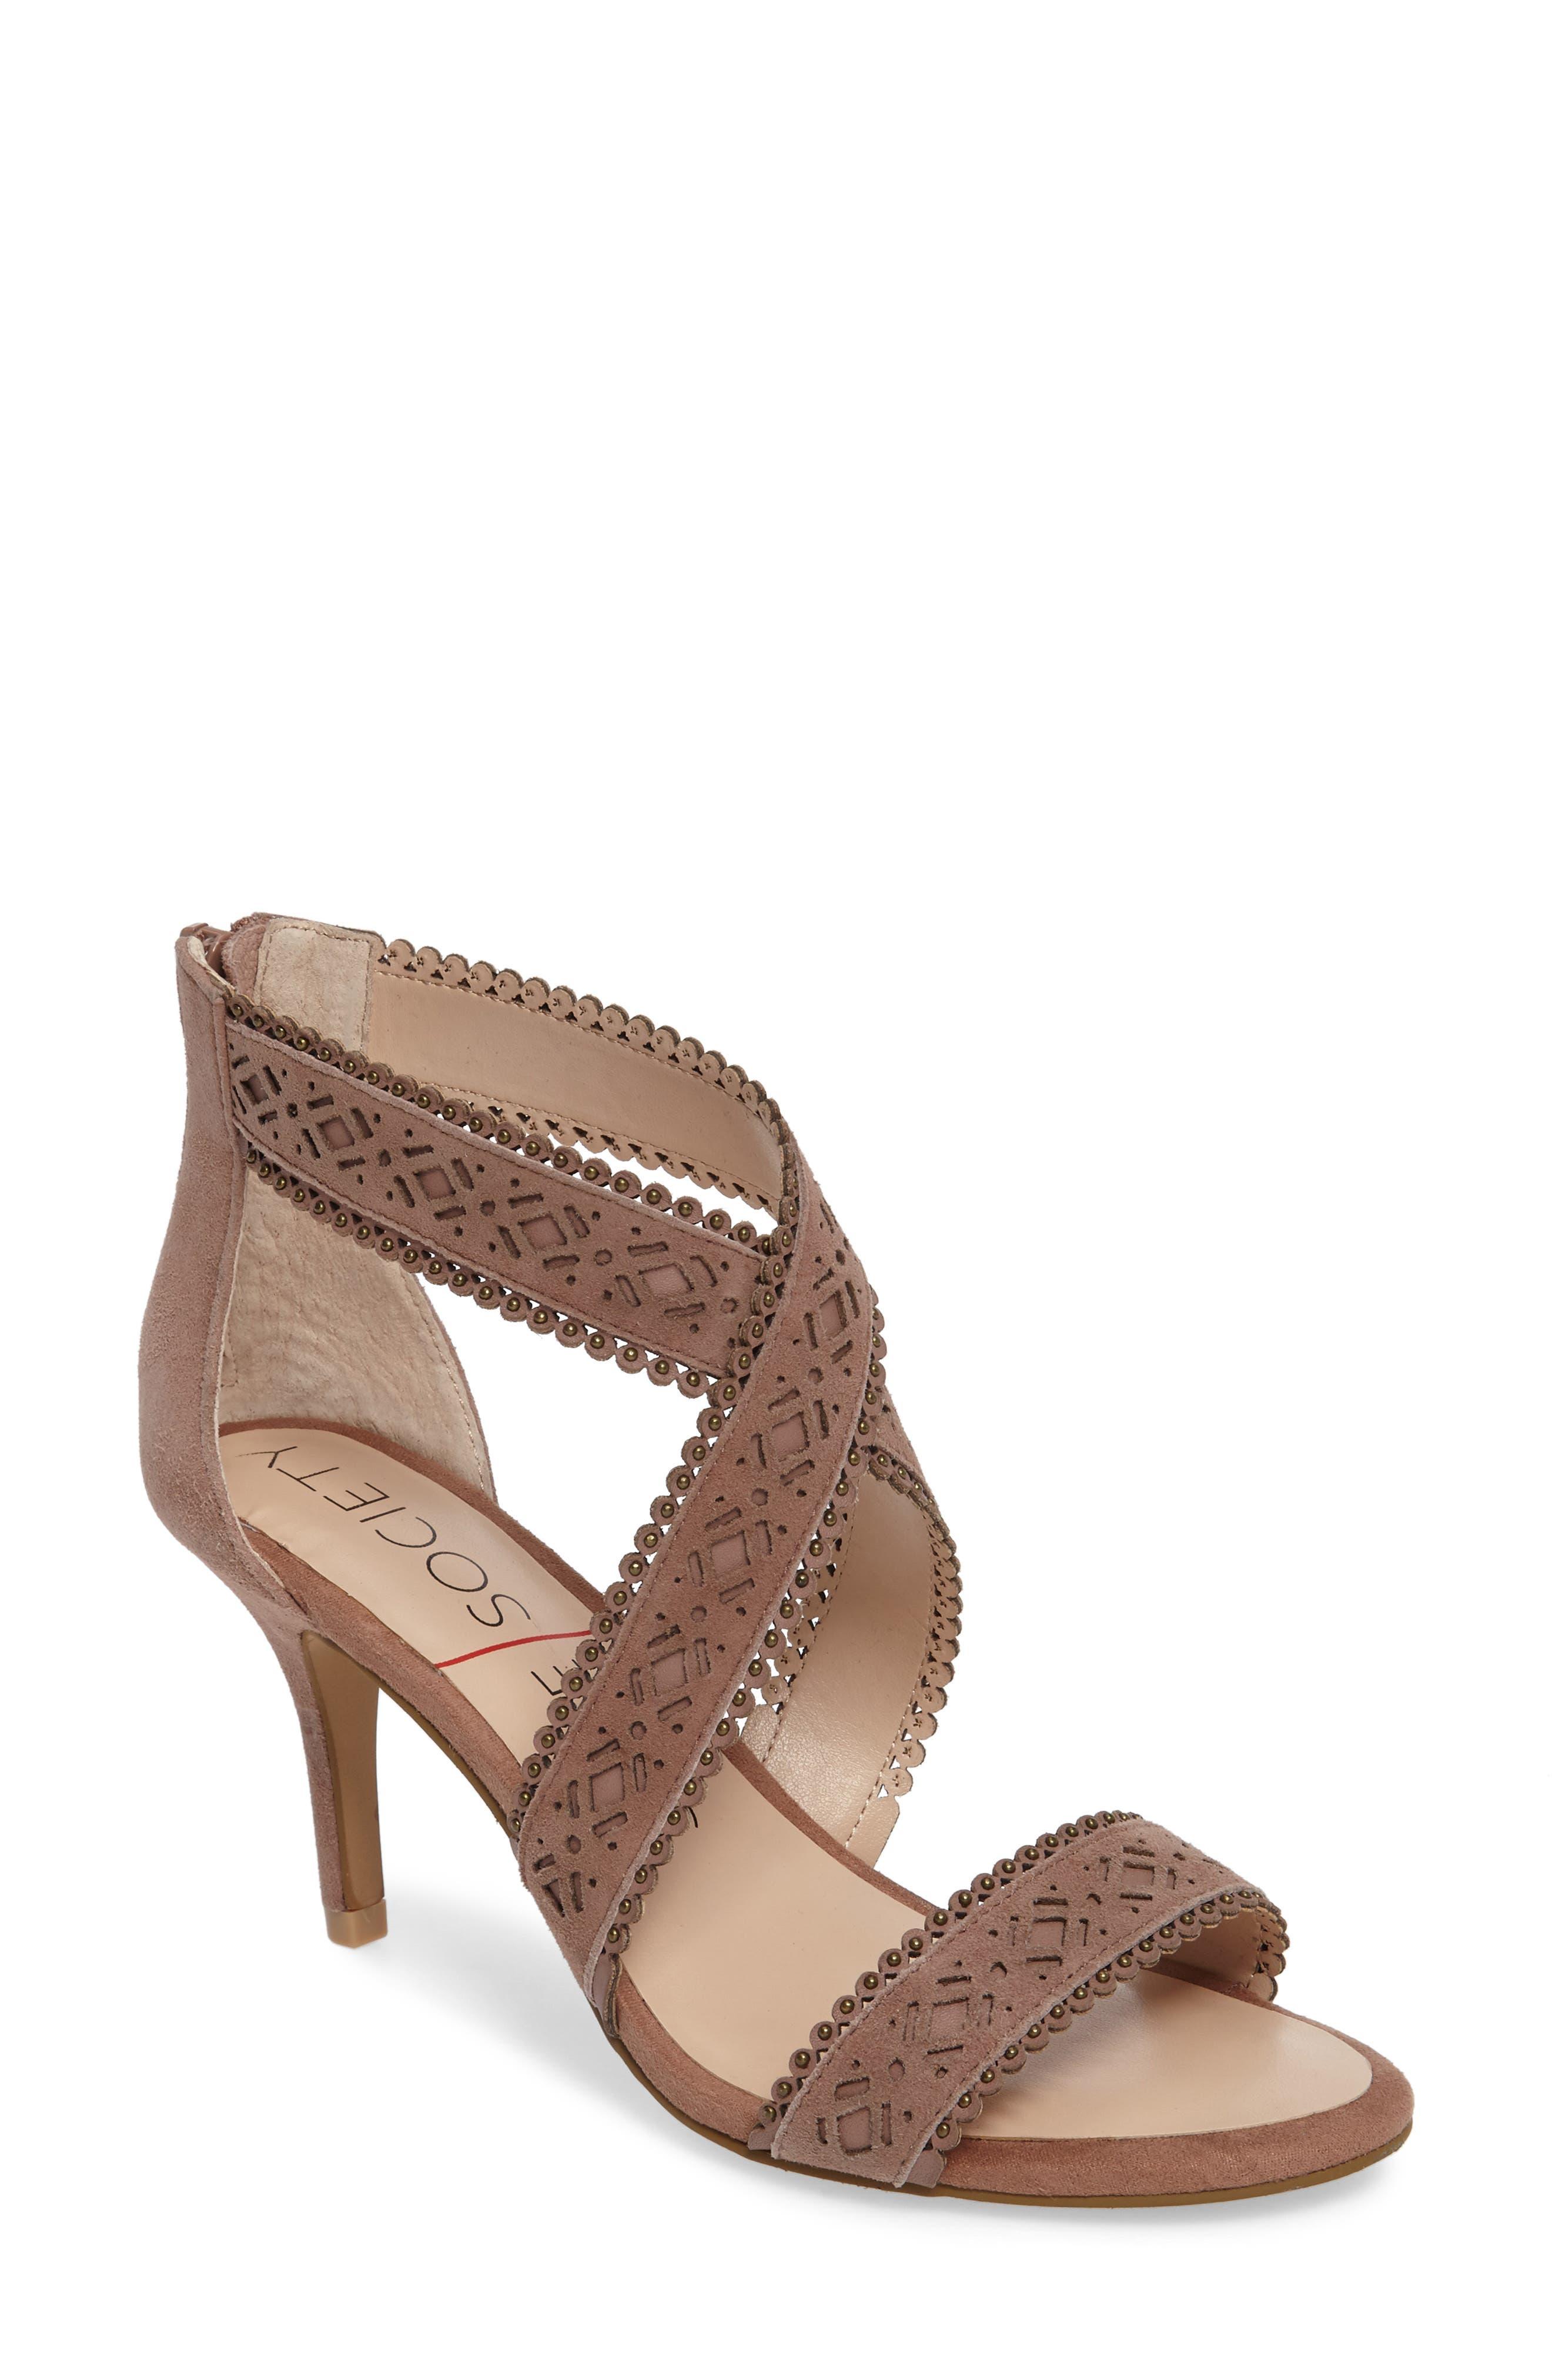 Alternate Image 1 Selected - Sole Society Sandal (Women)